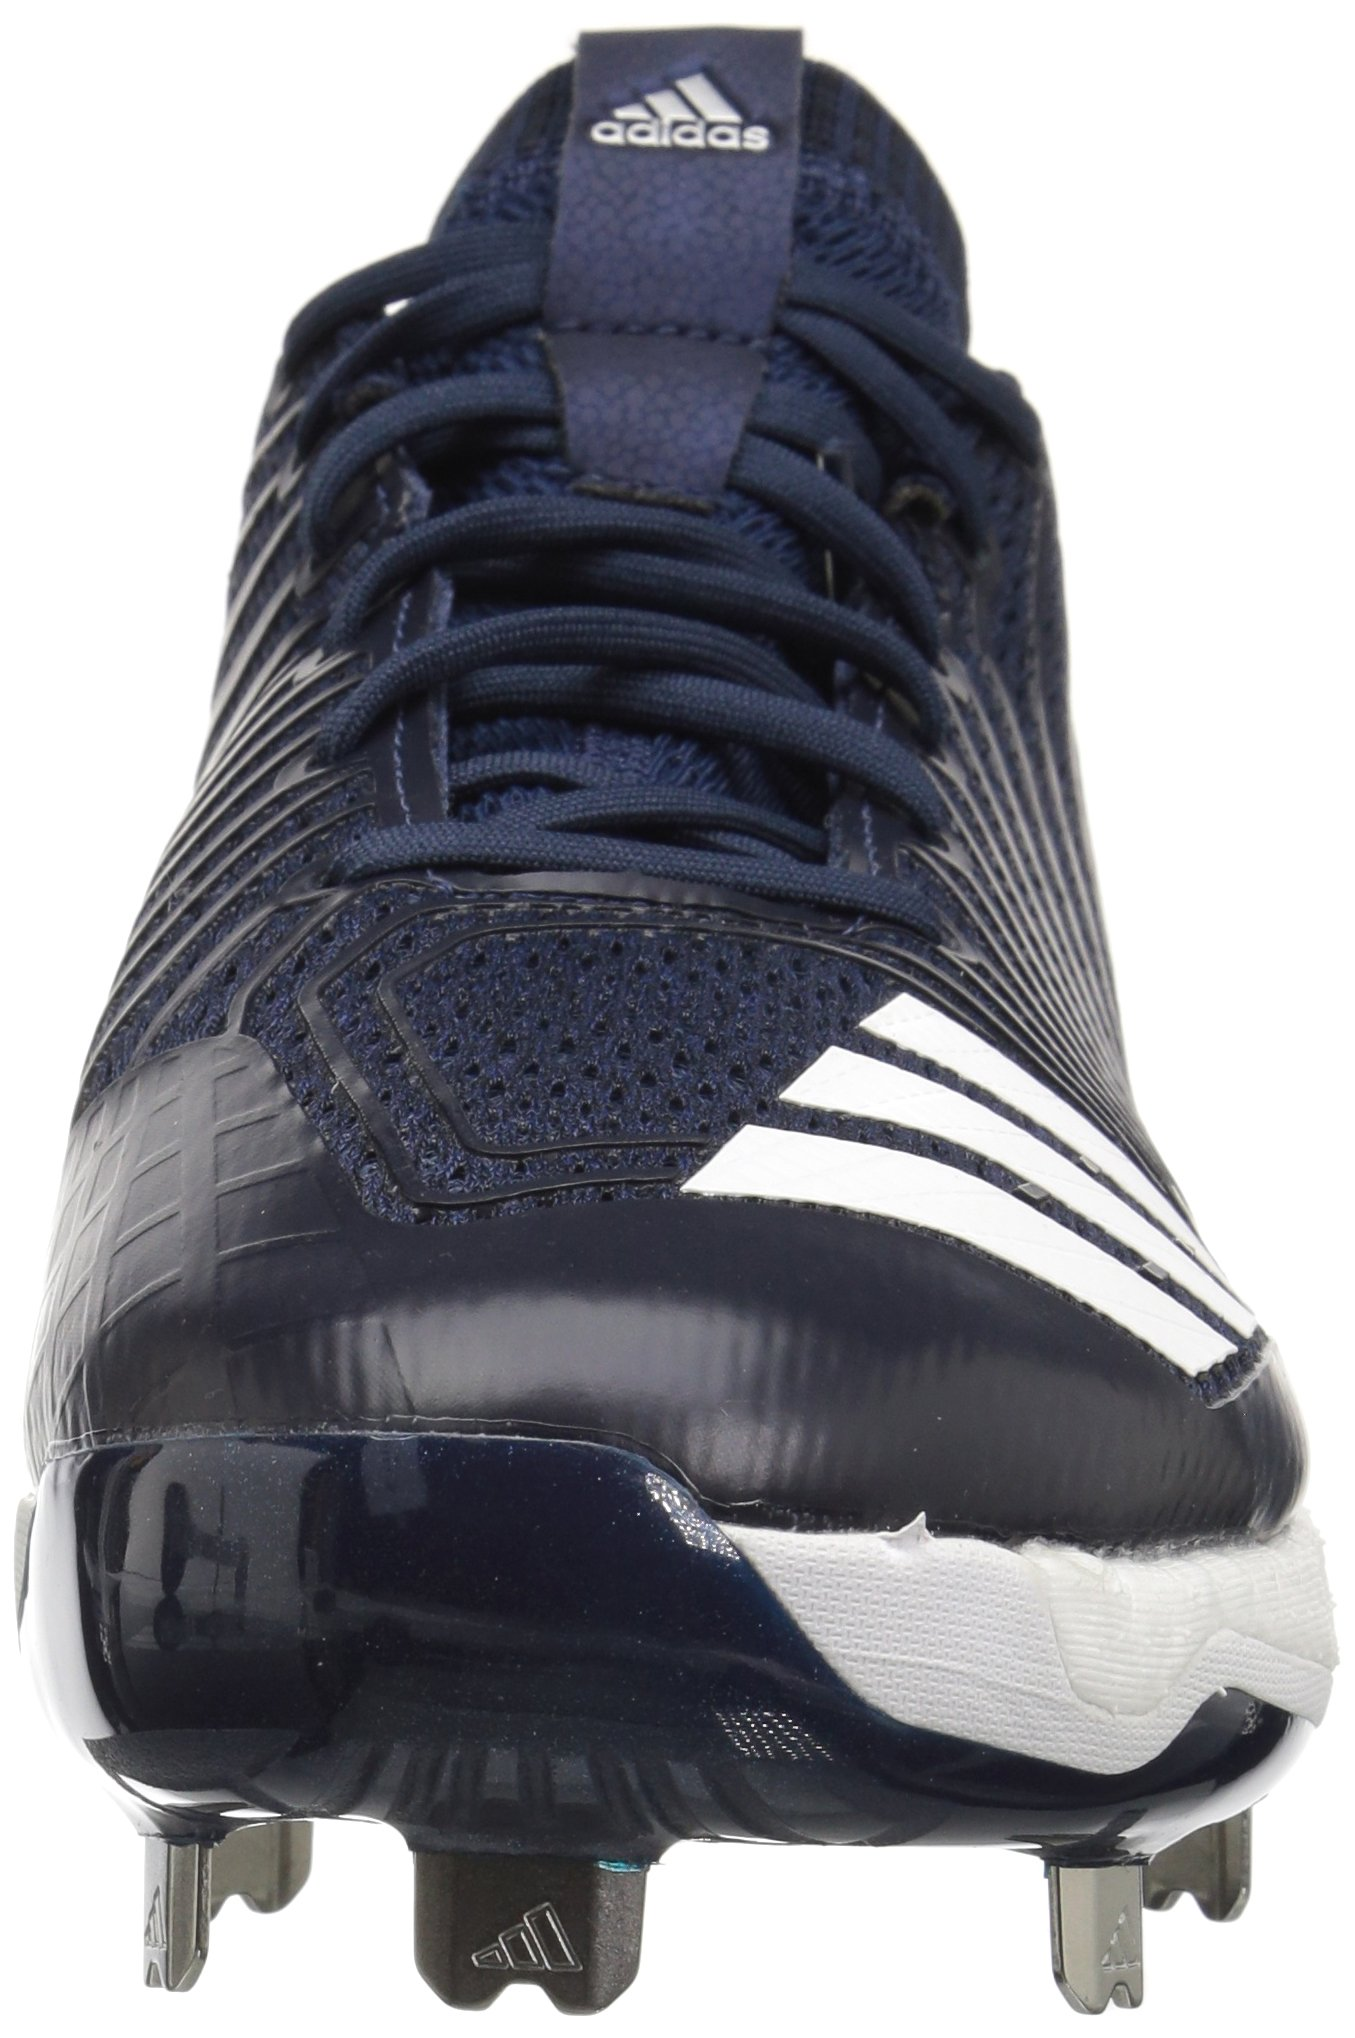 adidas Men's Freak X Carbon Mid Baseball Shoe, Collegiate Navy/White/Metallic Silver, 8 Medium US by adidas (Image #4)